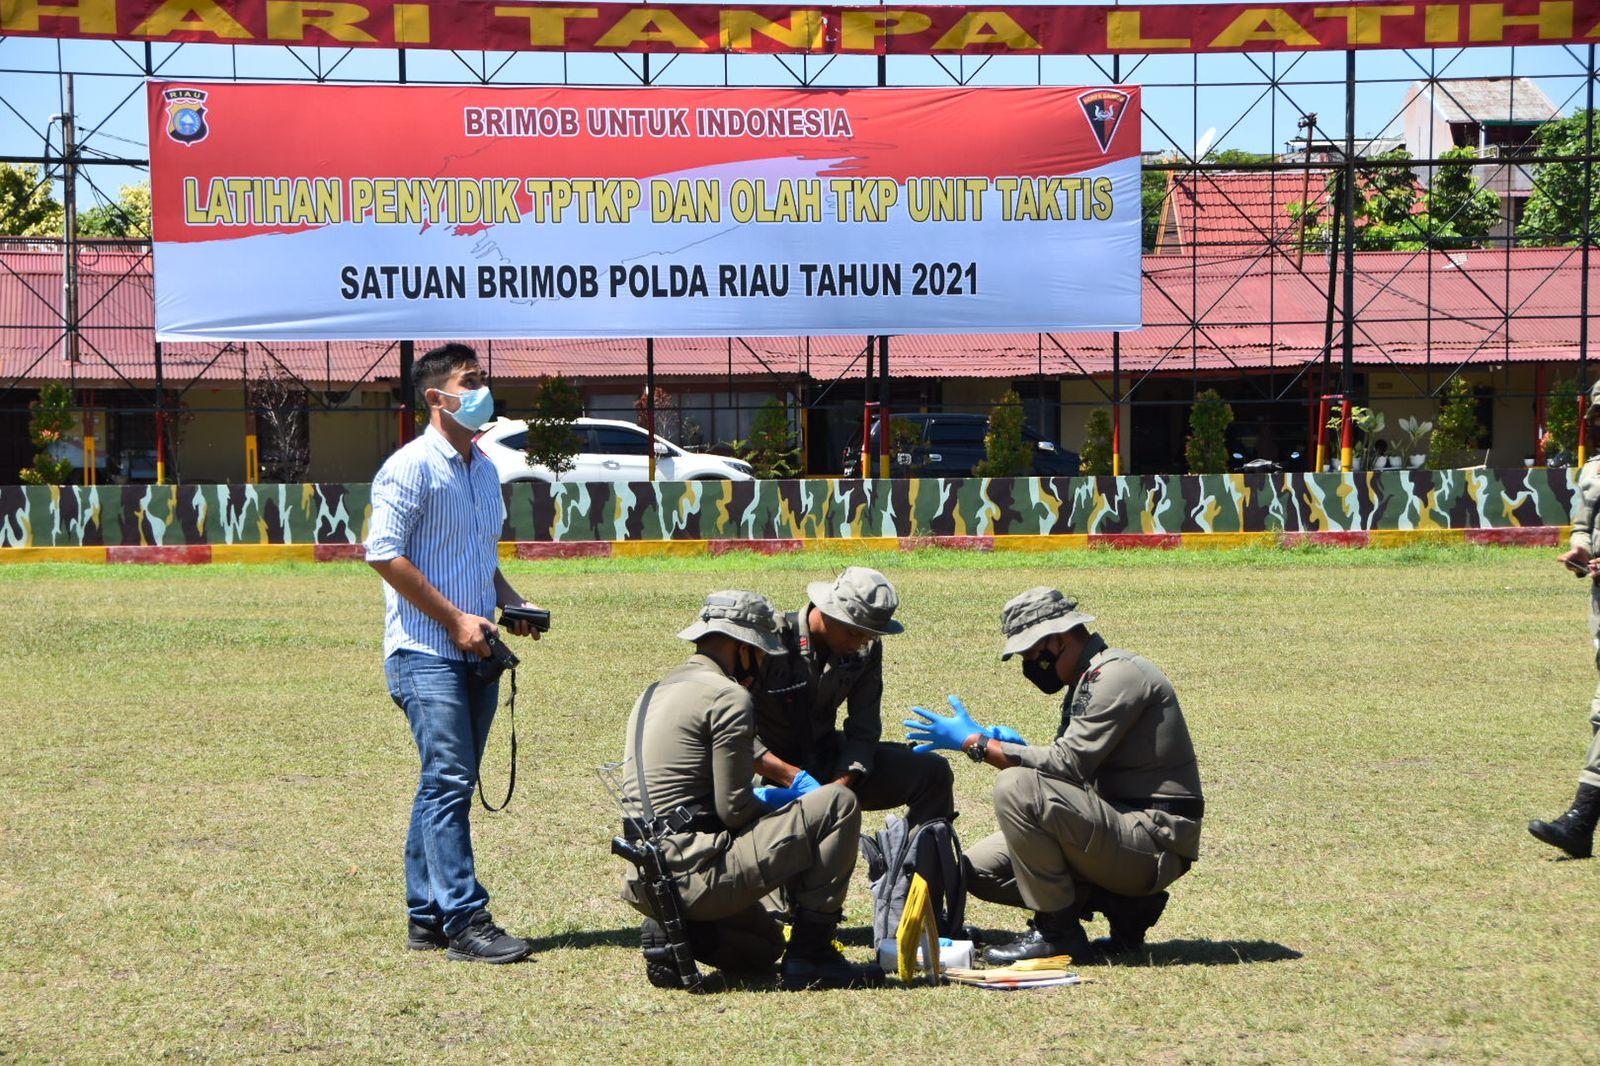 Personel Satuan Brimob Polda Riau Laksanakan Simulasi TPTKP dan Olah TKP Unit Taktis